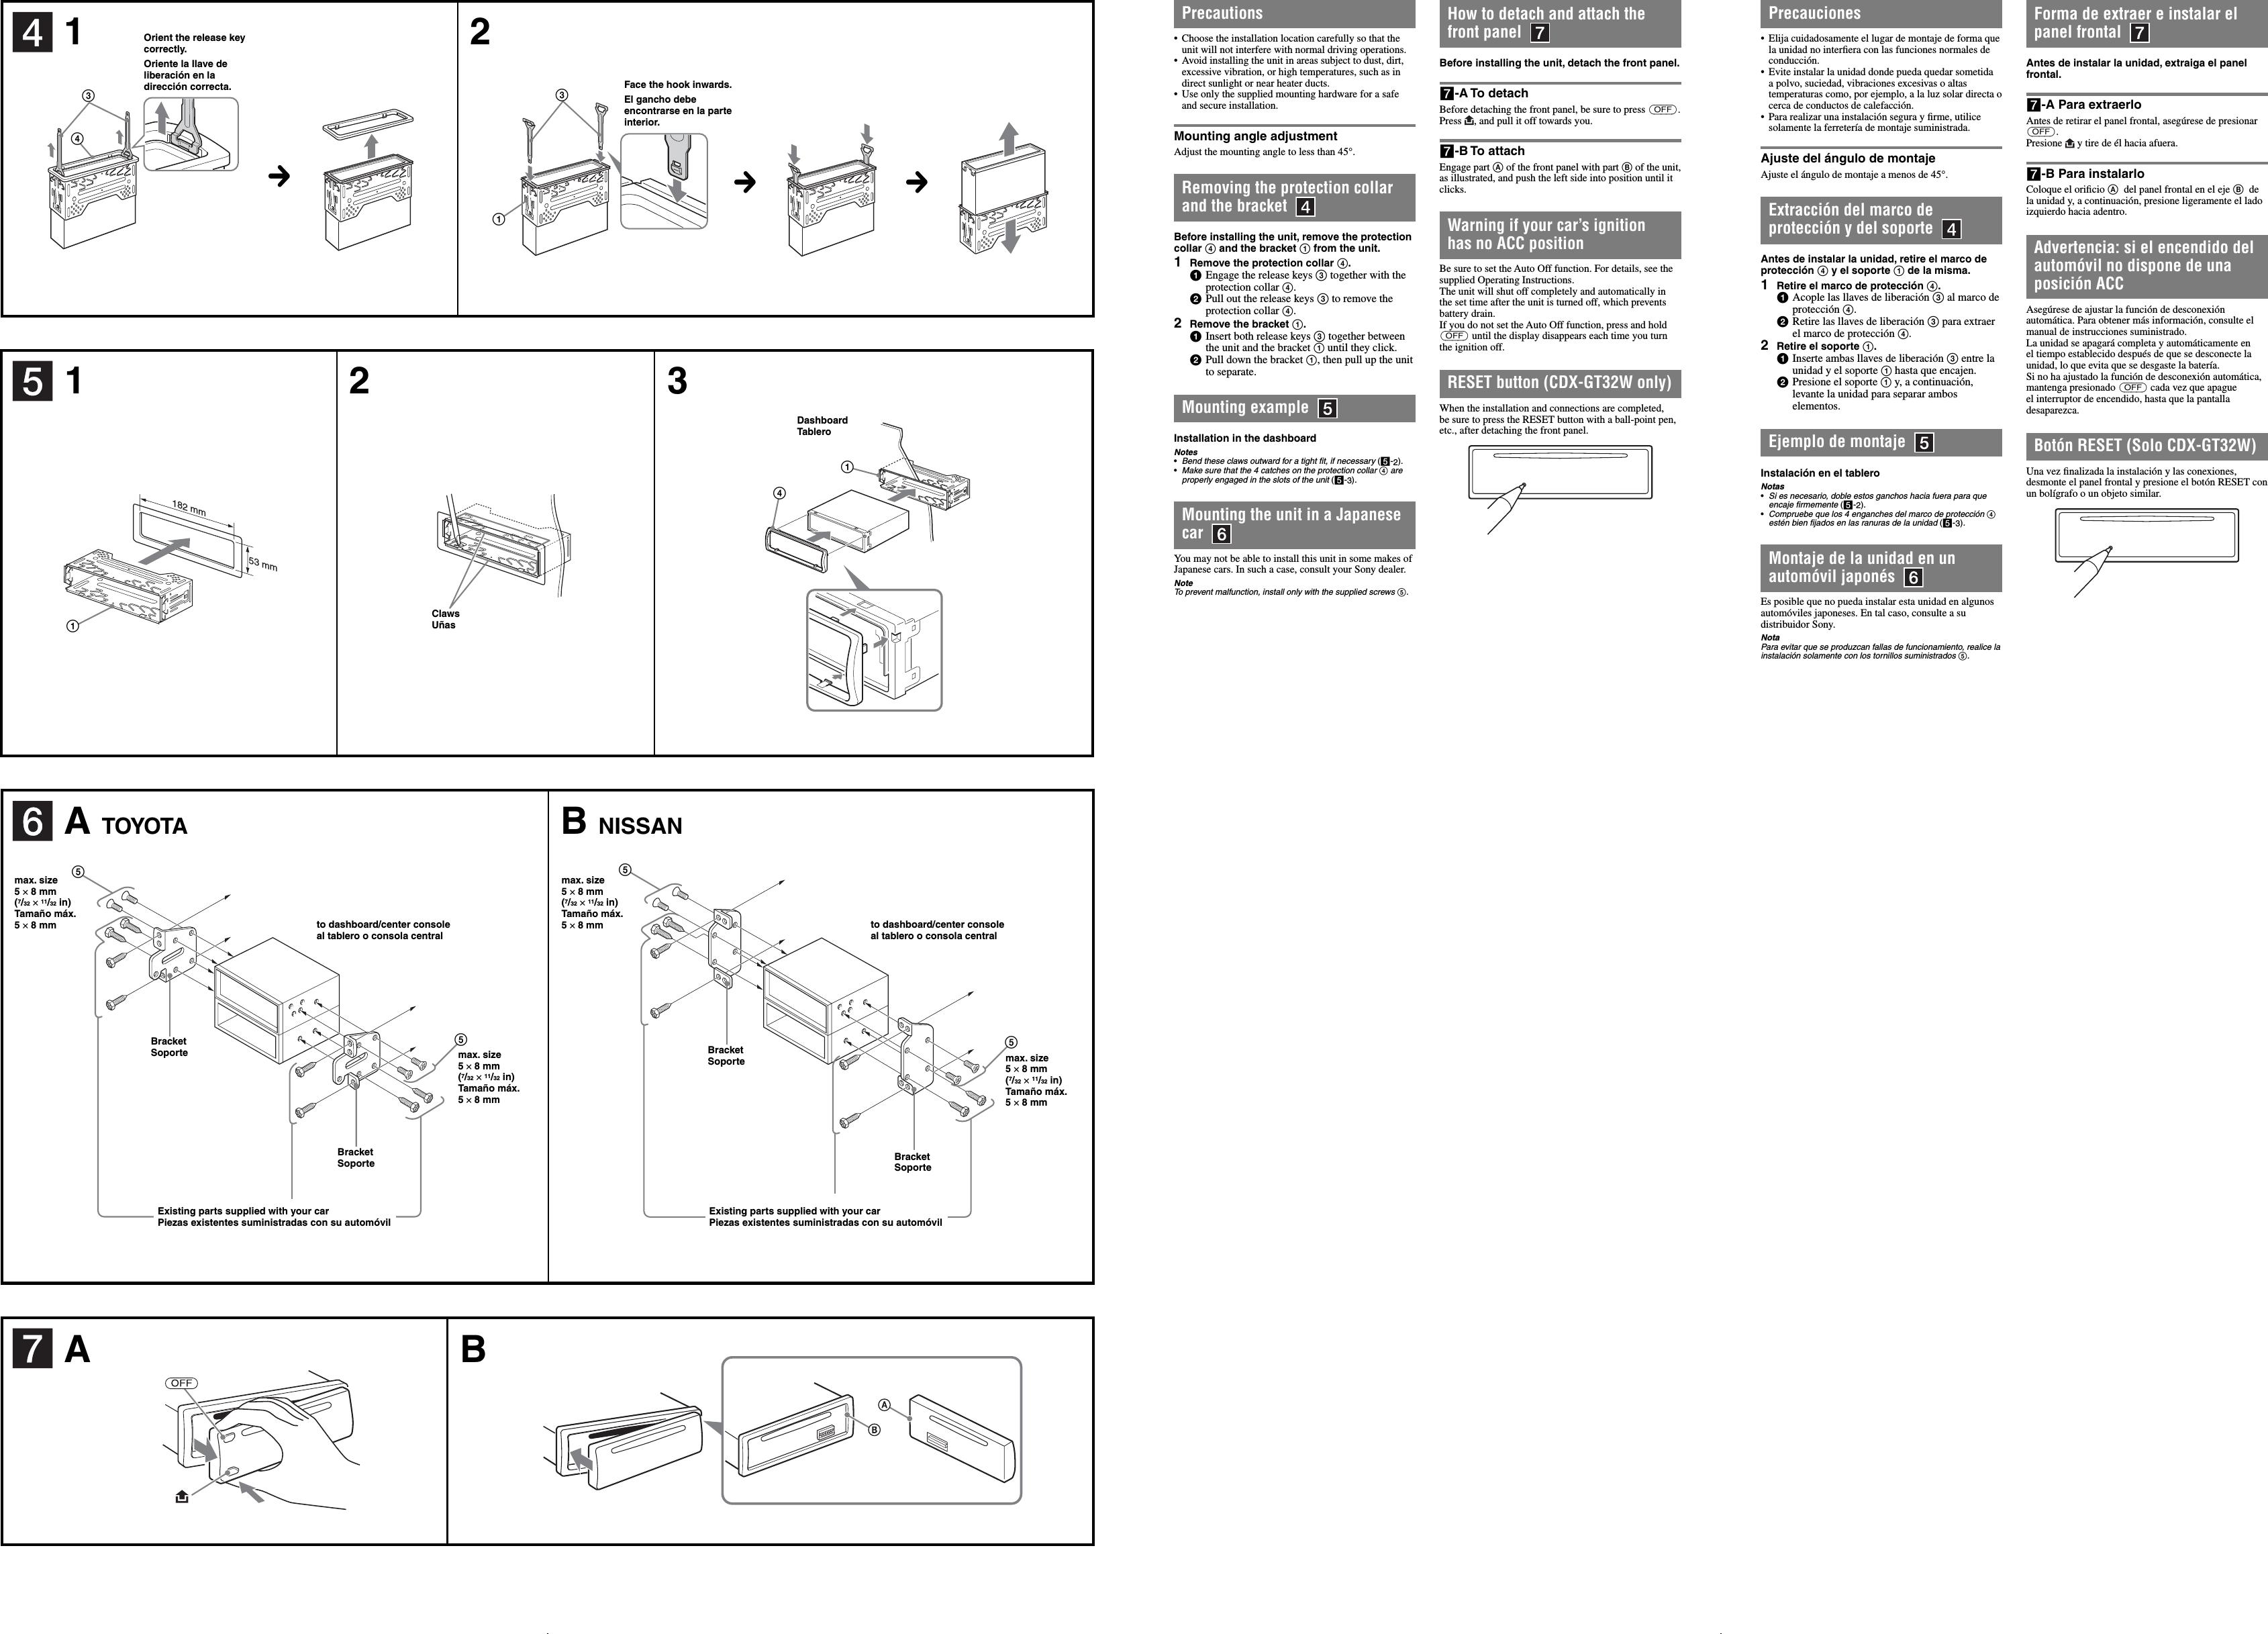 Sony Cdx Gt32w Wiring Diagram - Wiring Diagram Shw Xplod Sony Cdx Gt Wiring Diagram on